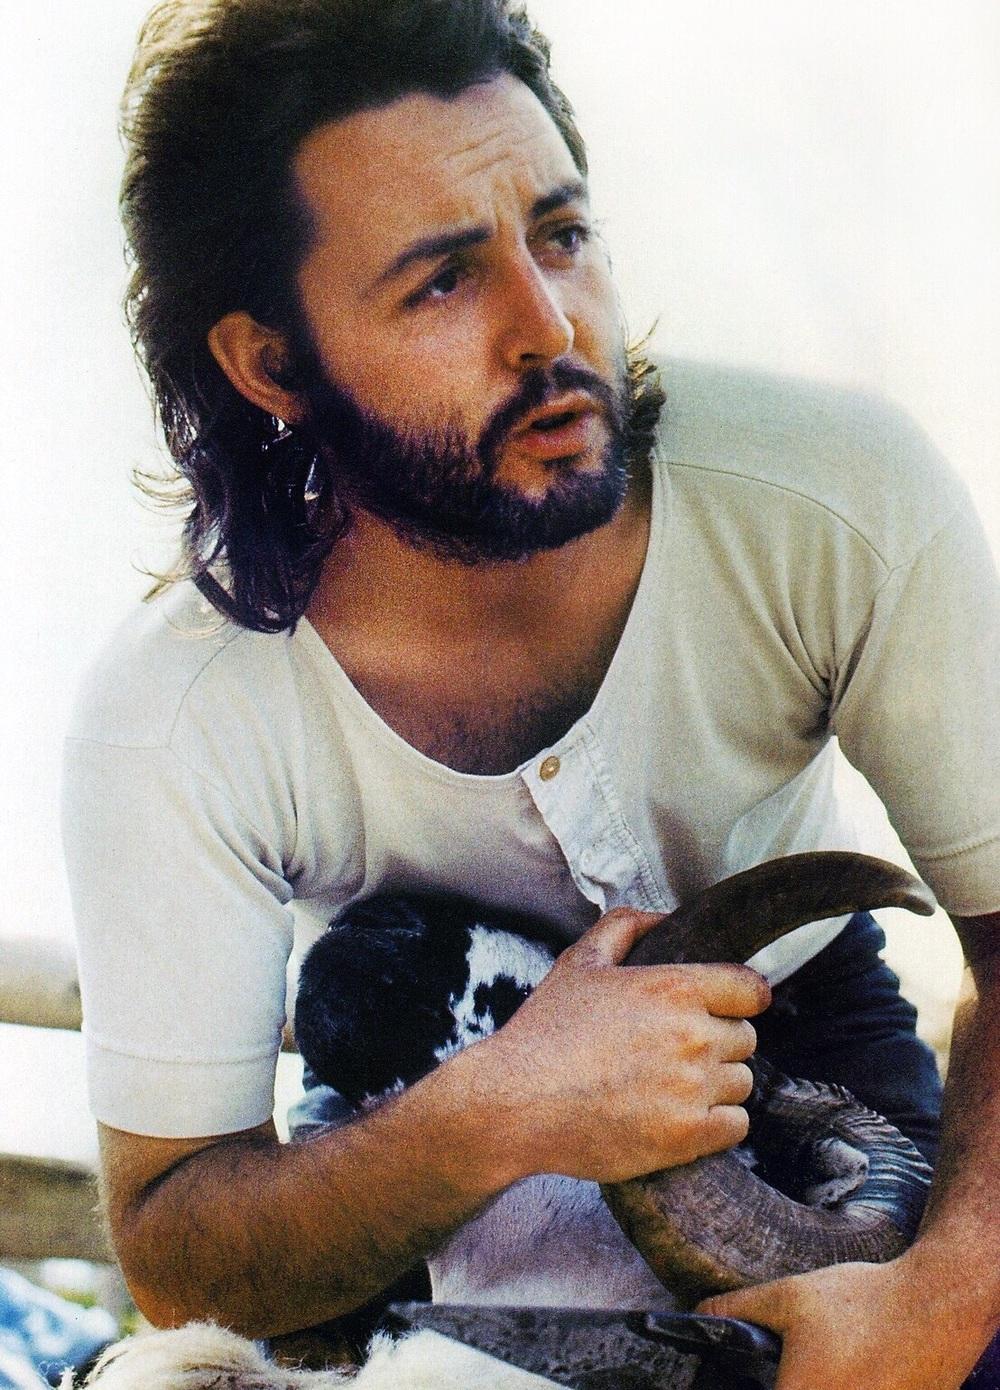 Paul McCartney circa 1971.